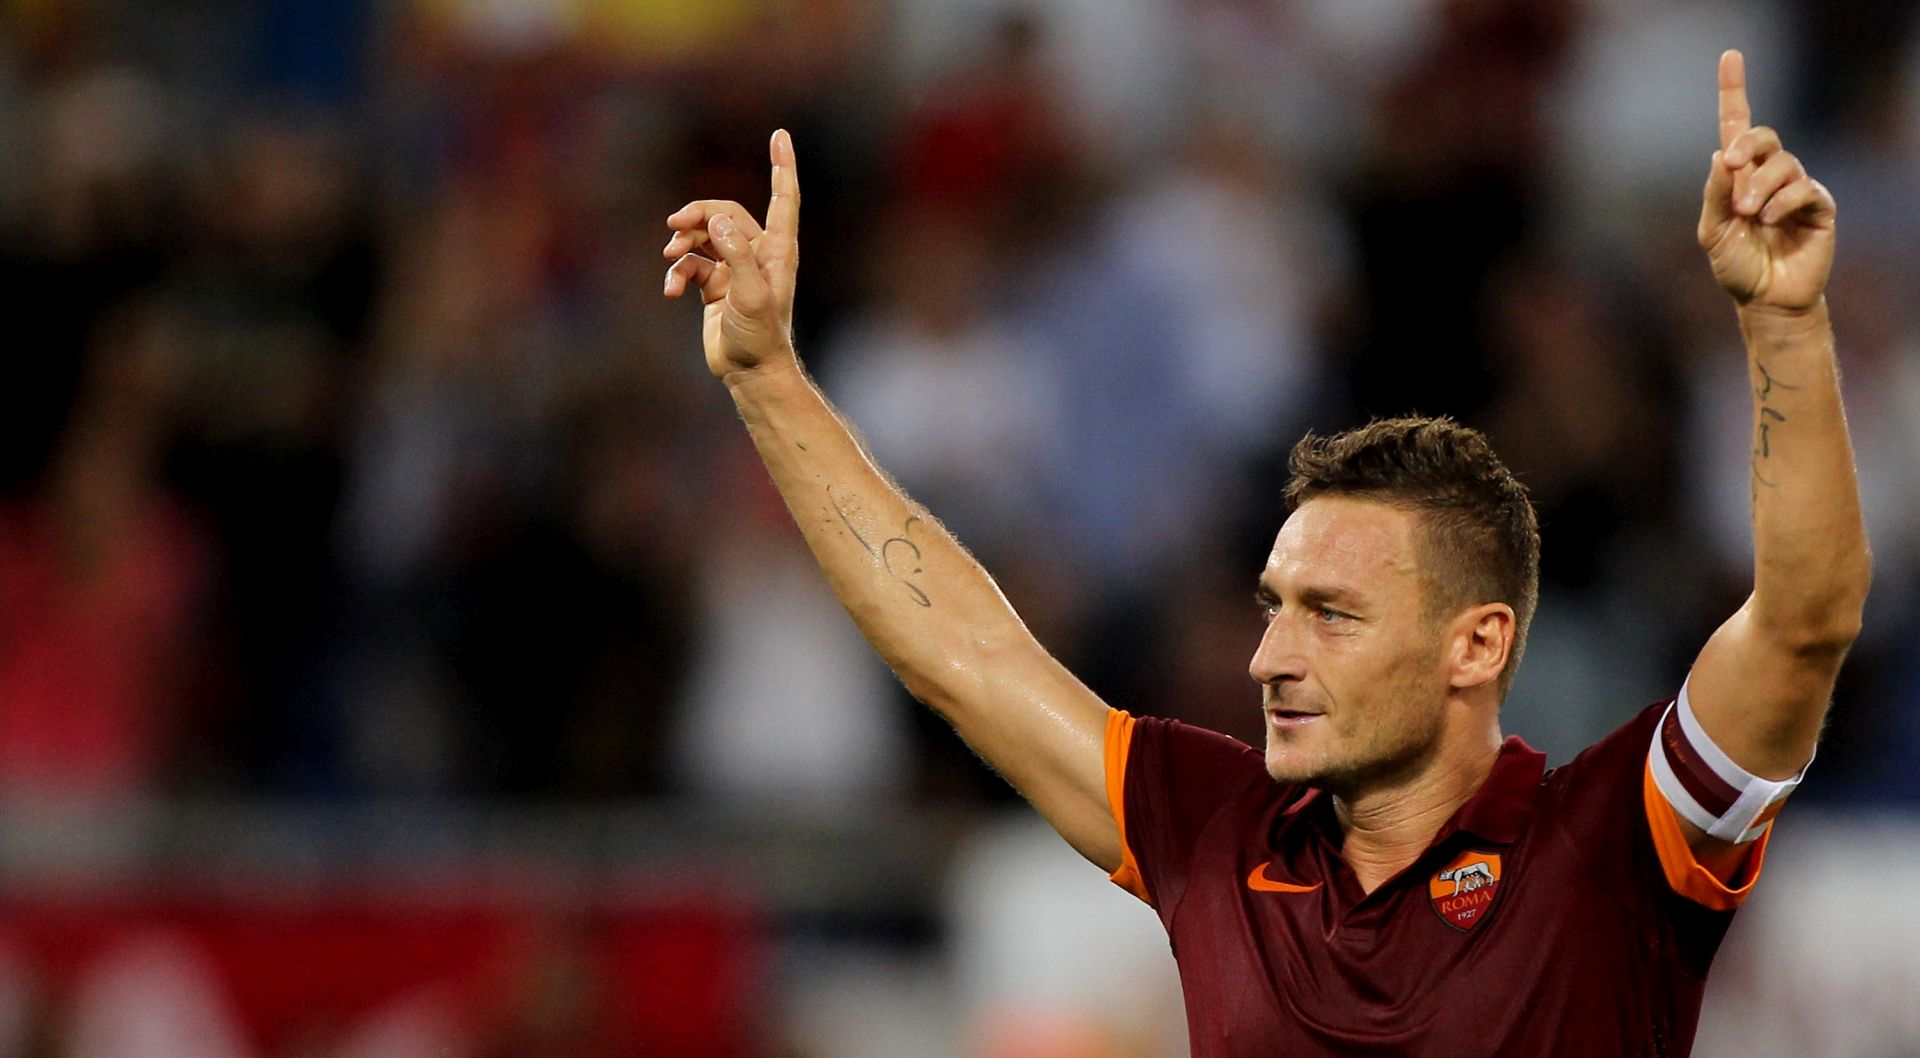 JE LI OVO KRAJ? Totti 'udario' po Romi, Spalletti ga izbacio iz momčadi